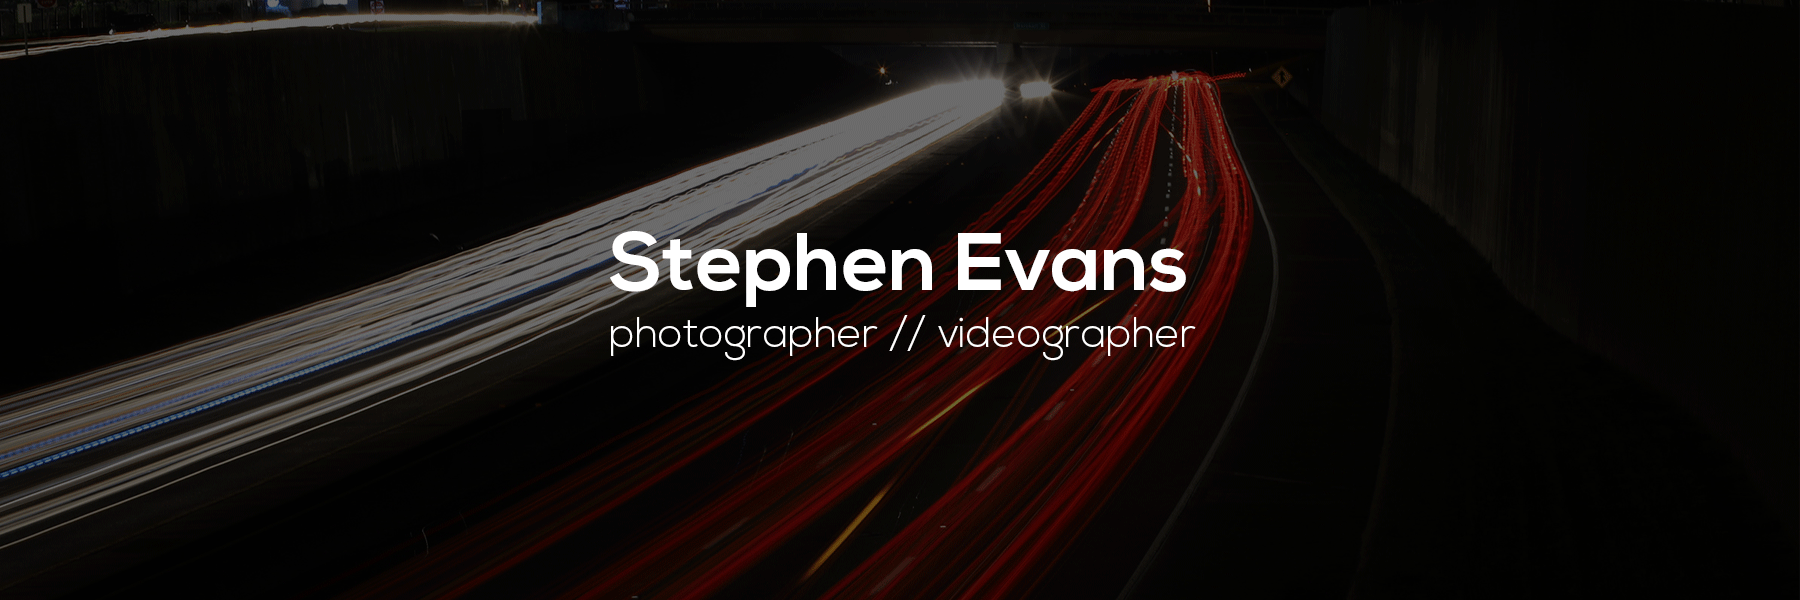 Stephen Evans Media